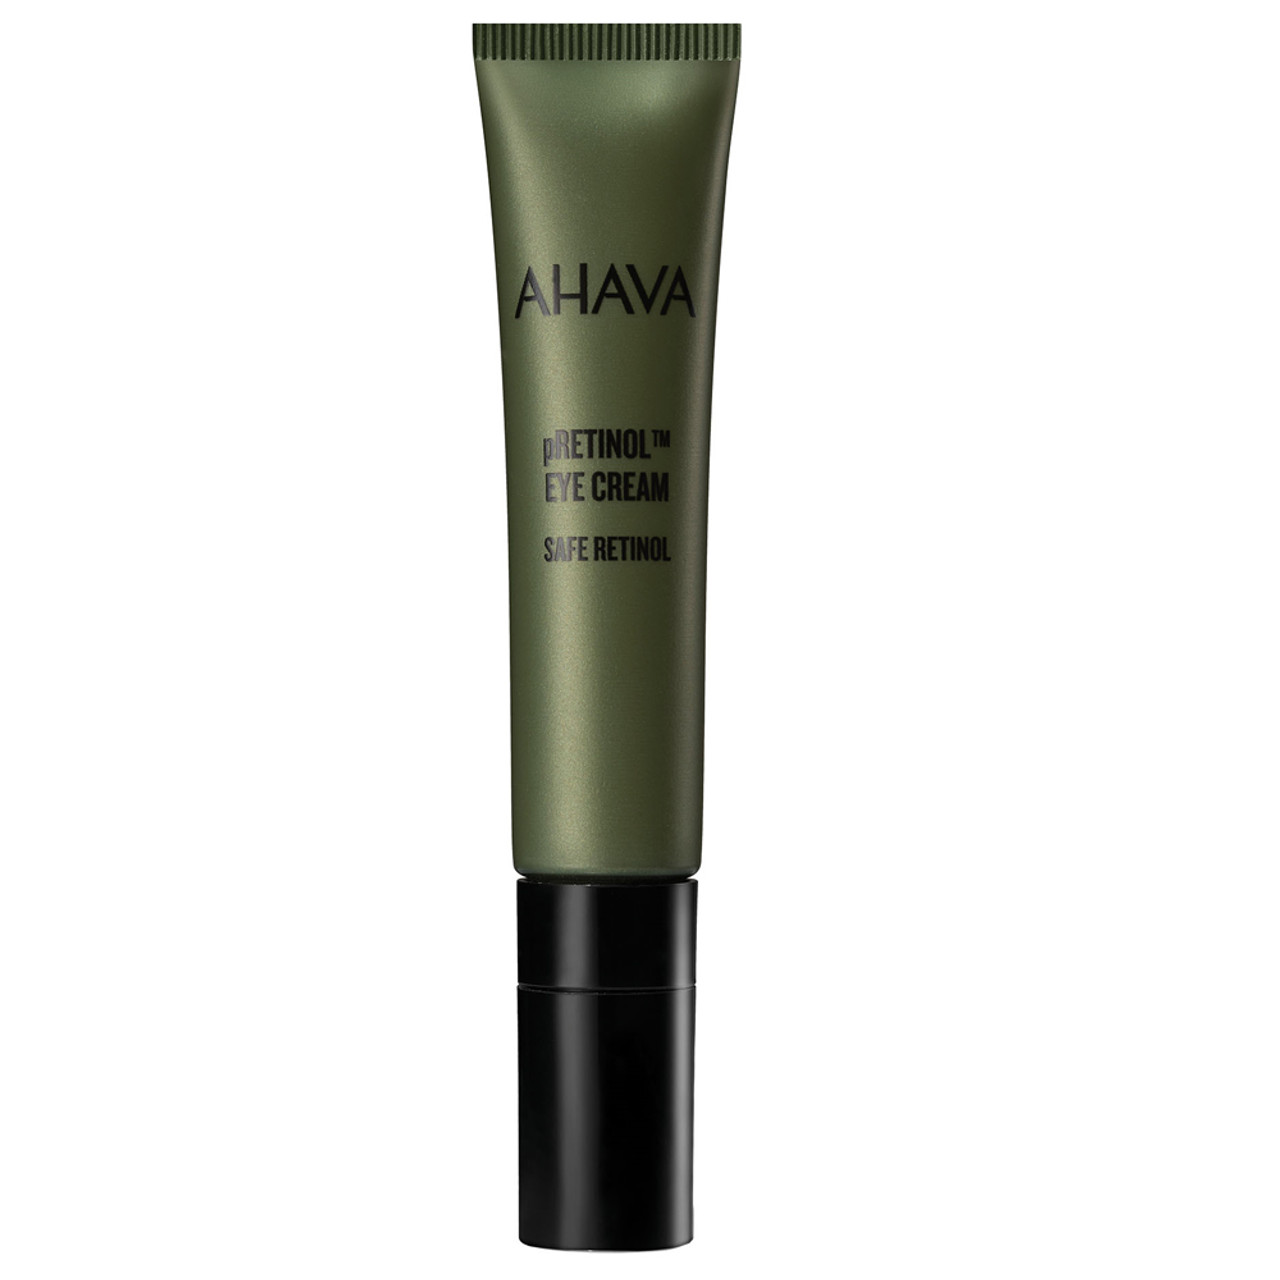 AHAVA pRetinol Eye Cream